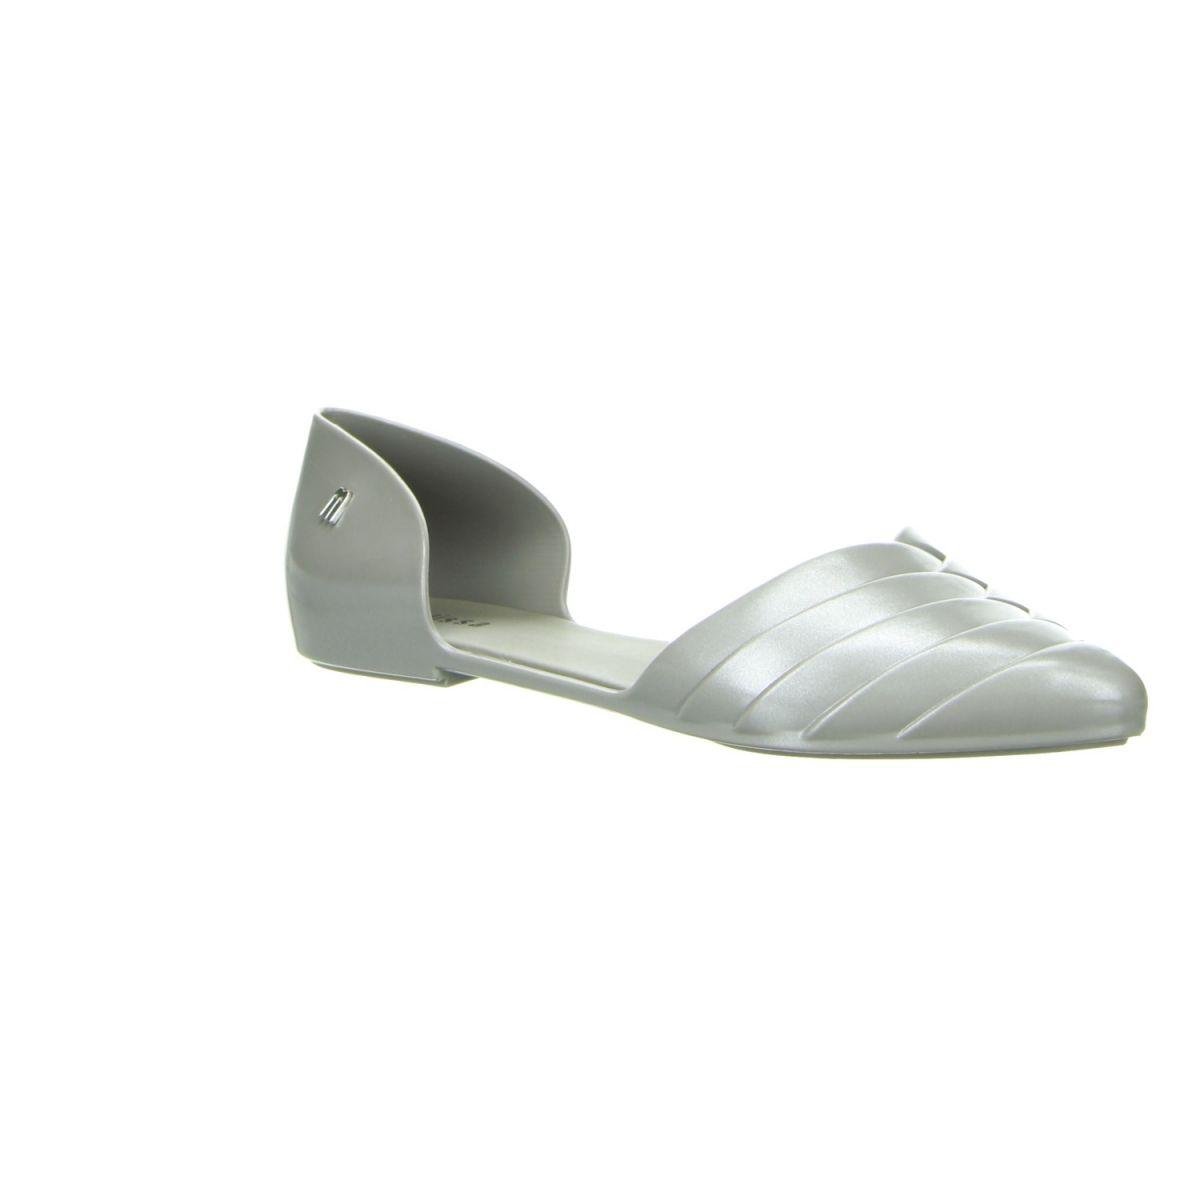 Tolle #Petal in #Silber Grau #Schuhe